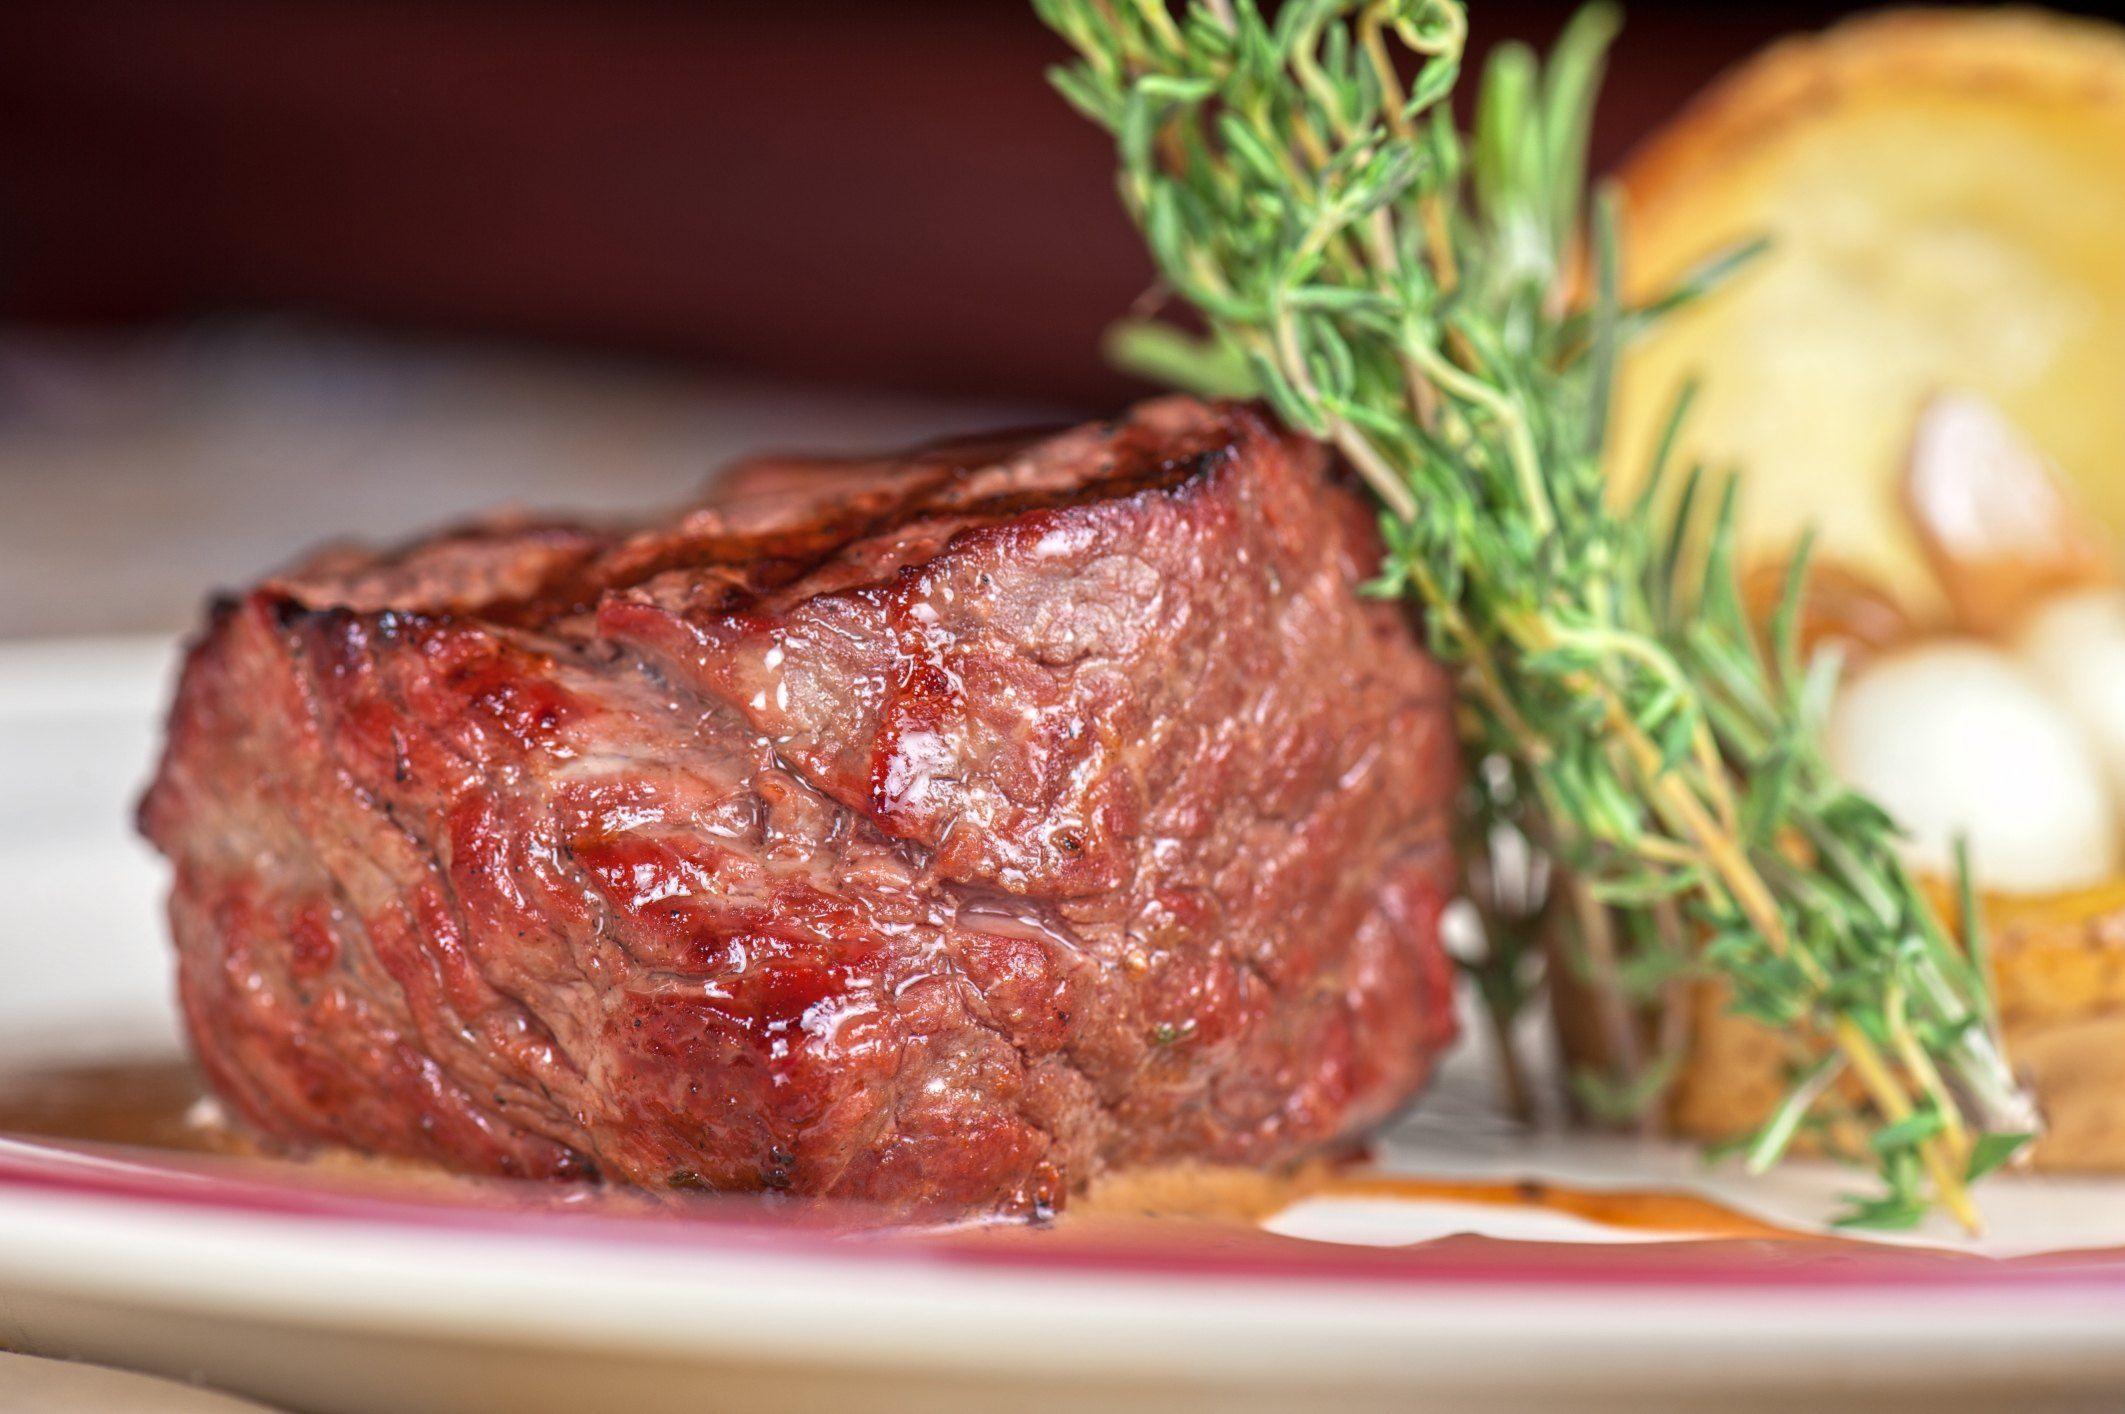 How To Grill Chateaubriand Livestrong Com Et Yemekleri En 2020 Platos De Carne Lomo De Res Solomillo De Ternera